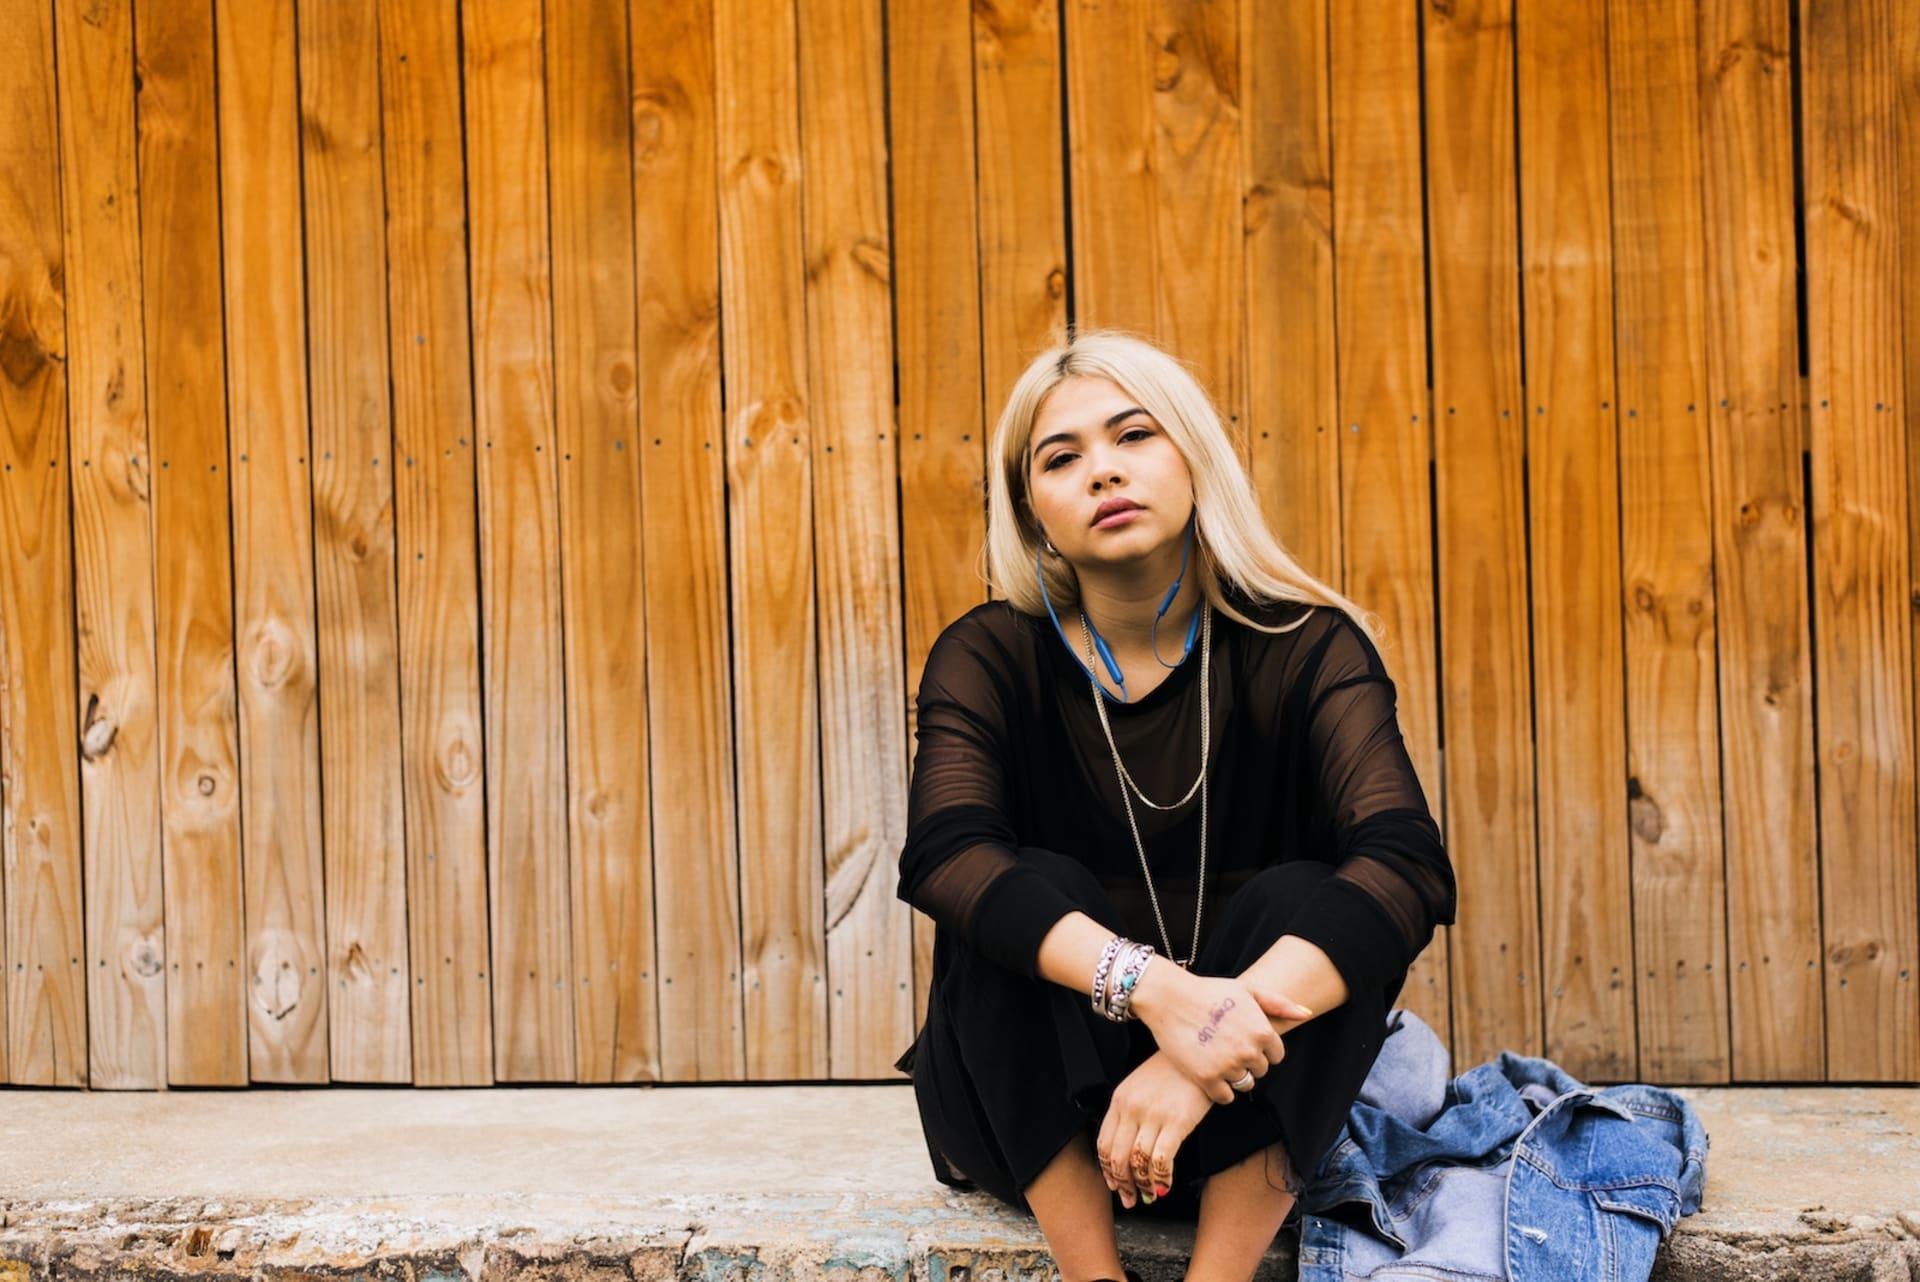 Hayley Kiyoko for Beats By Dre